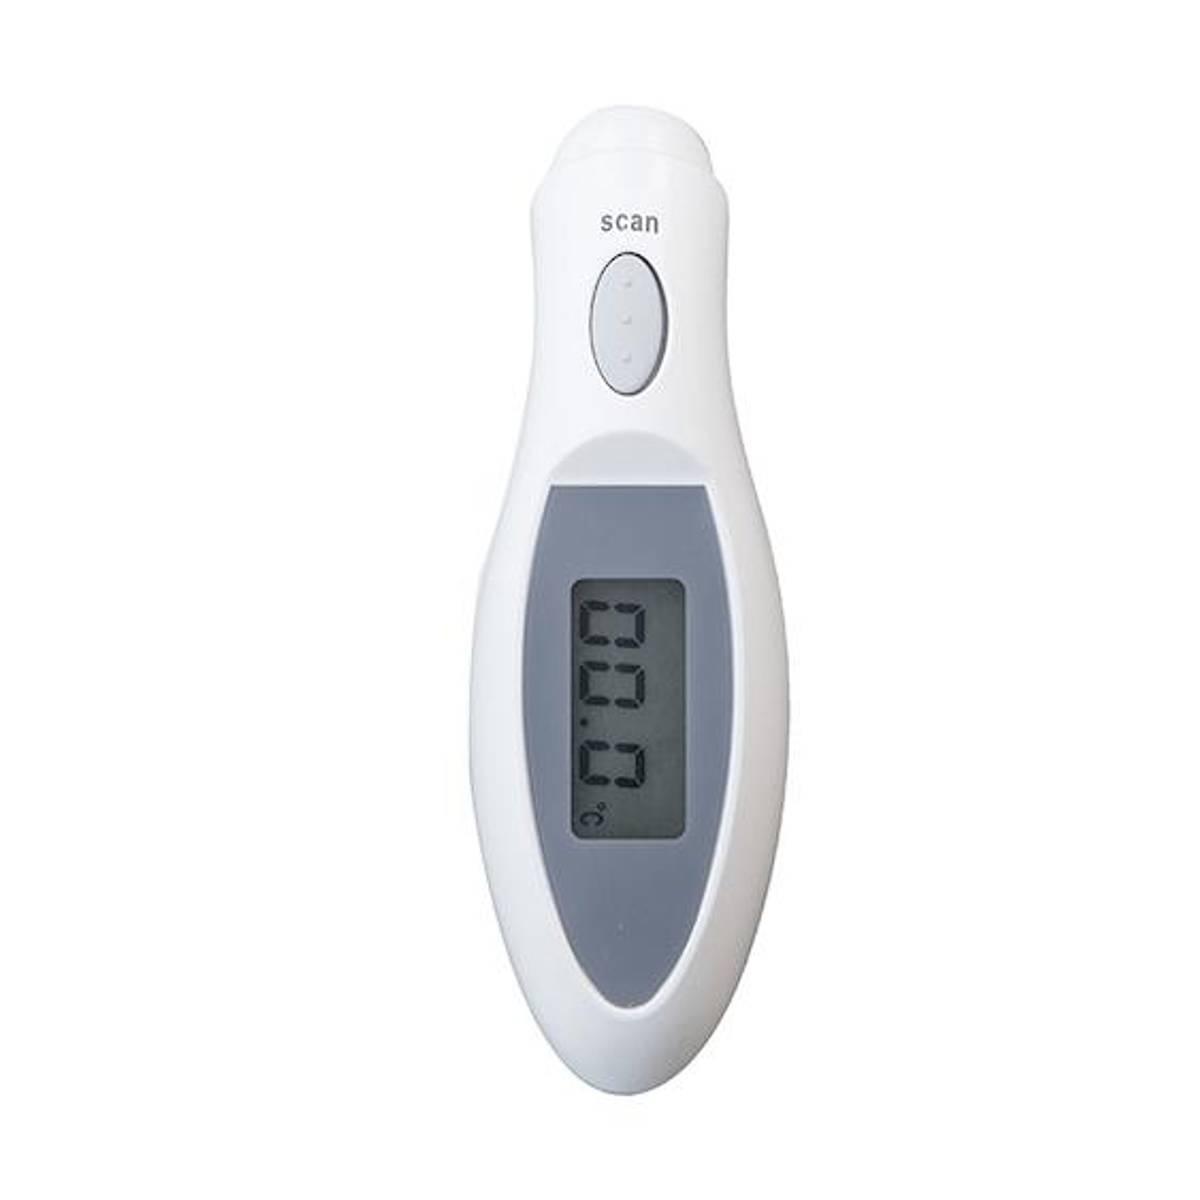 Kaxholmen Infrarød Termometer